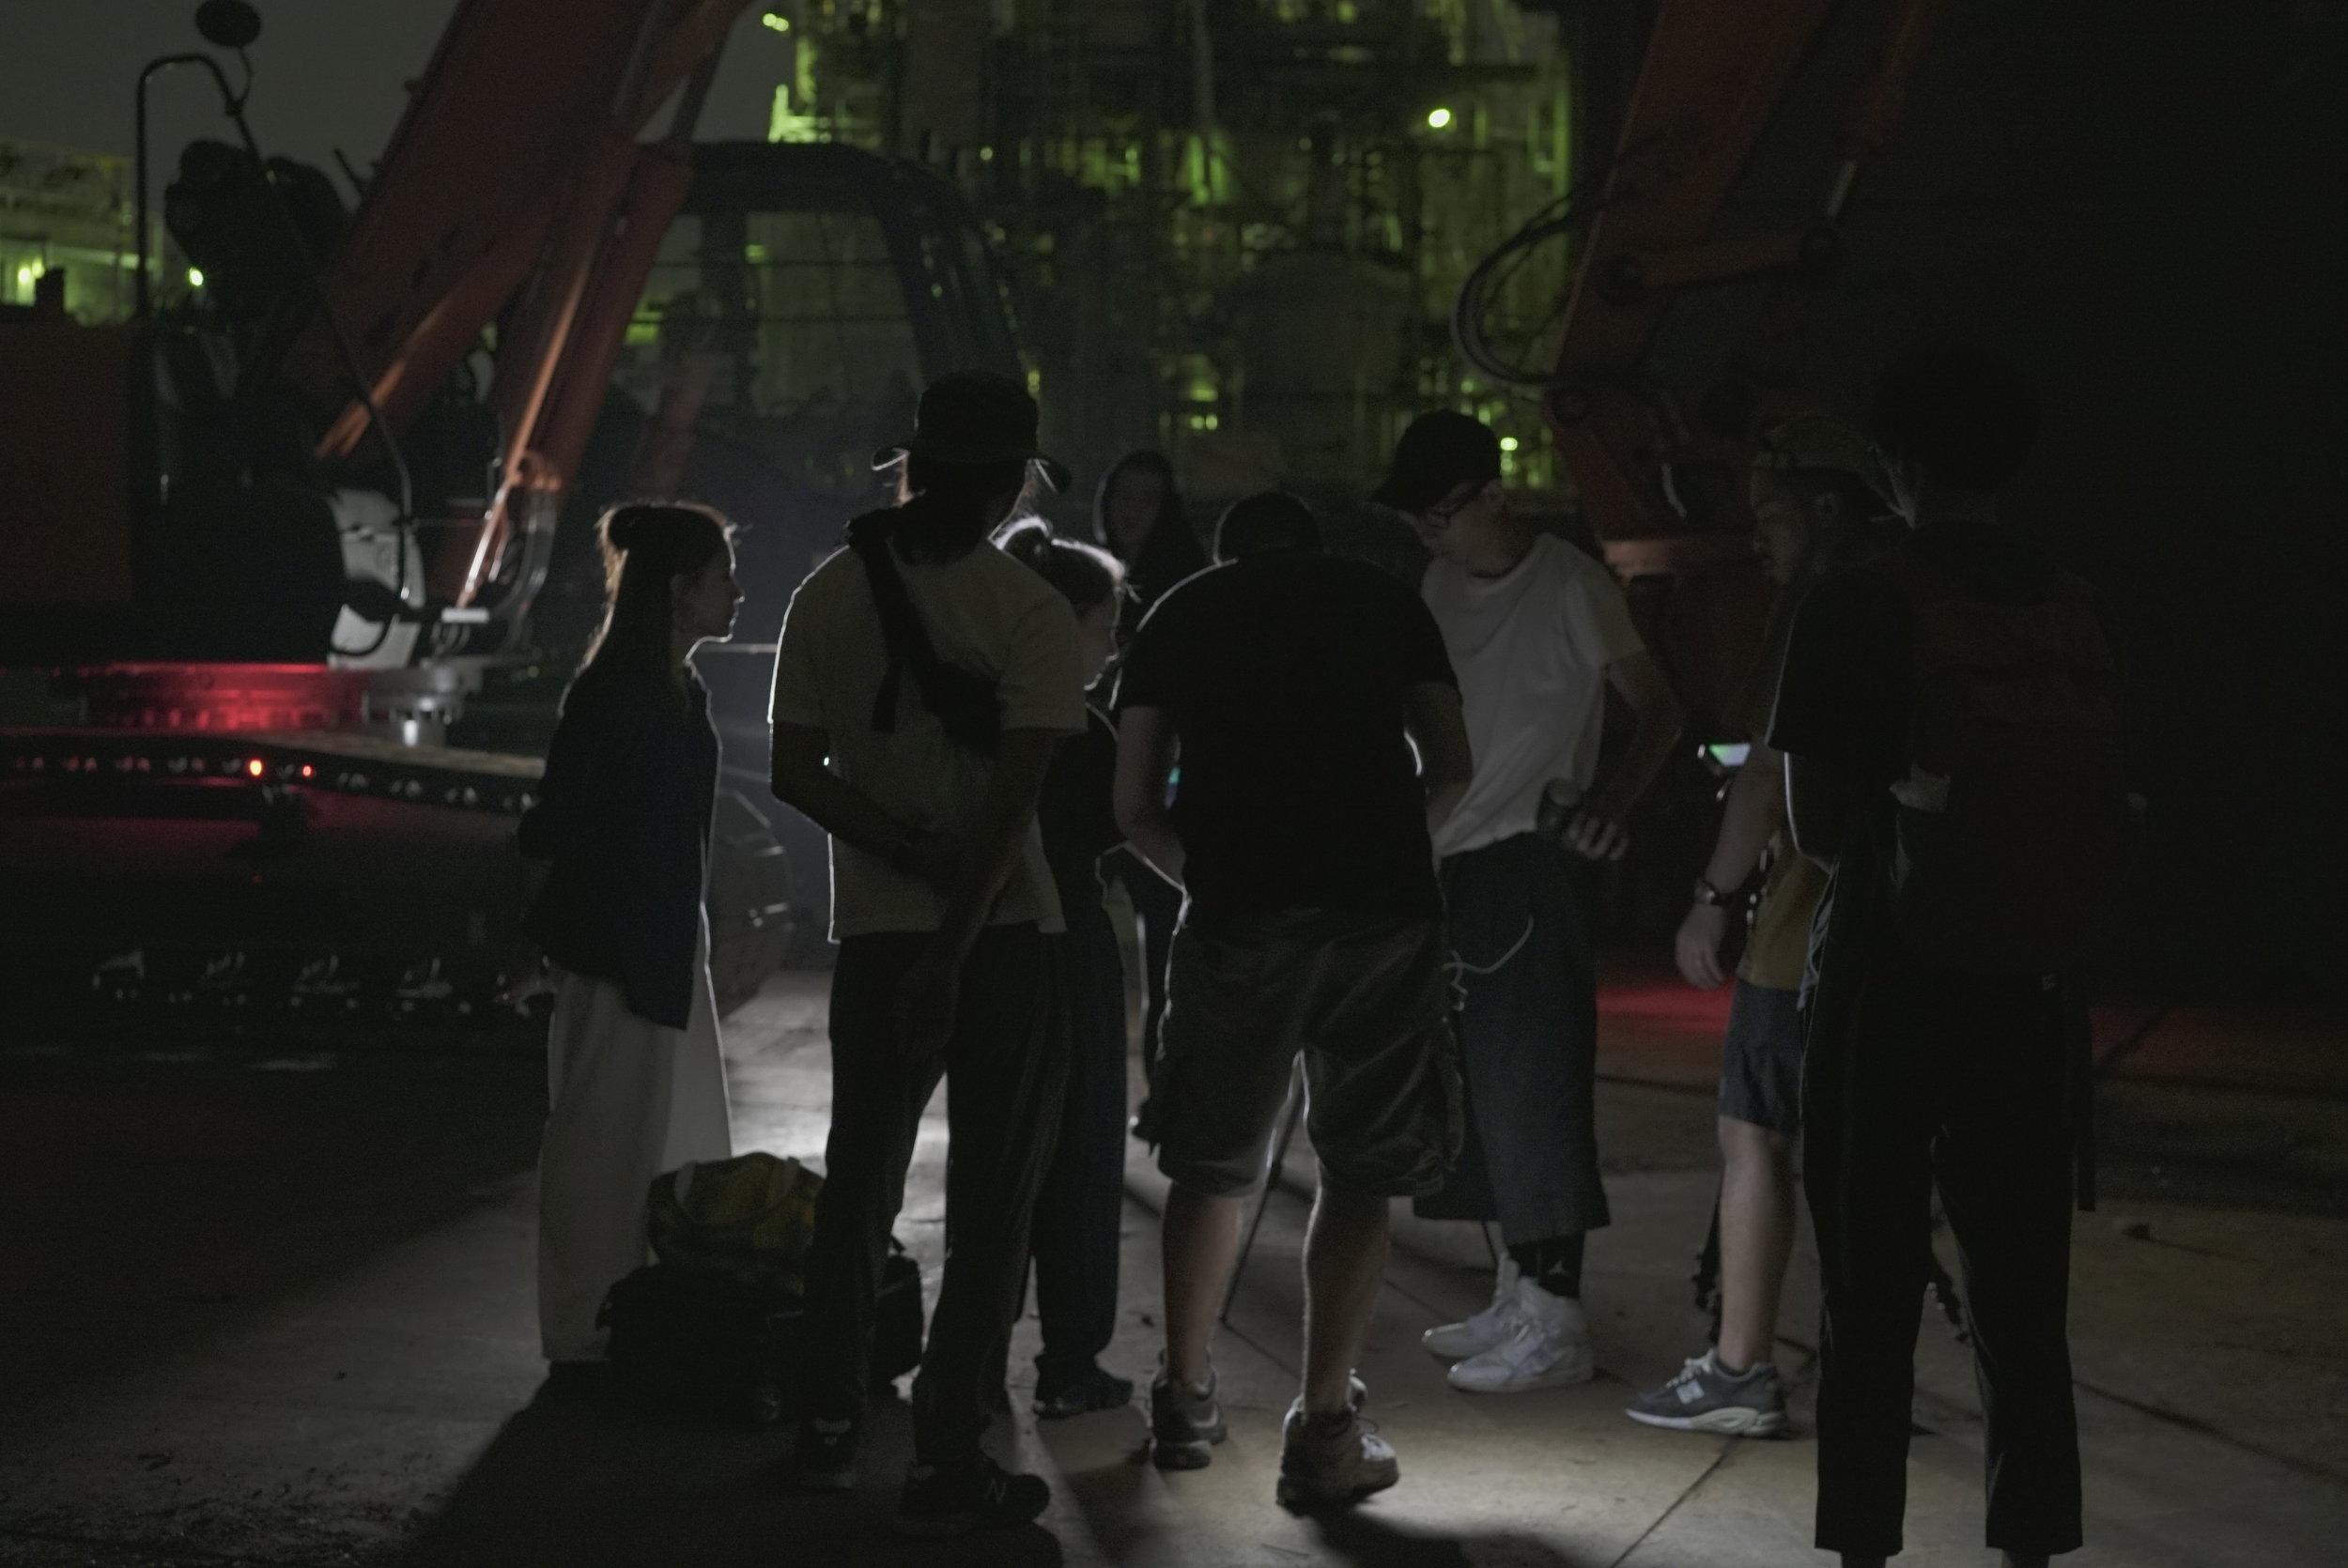 Capsule48 worked with Shanghai-based photographers 'NK7' and 'floatfish', along with Hong Kong-based cinematographer Tim Richardson.